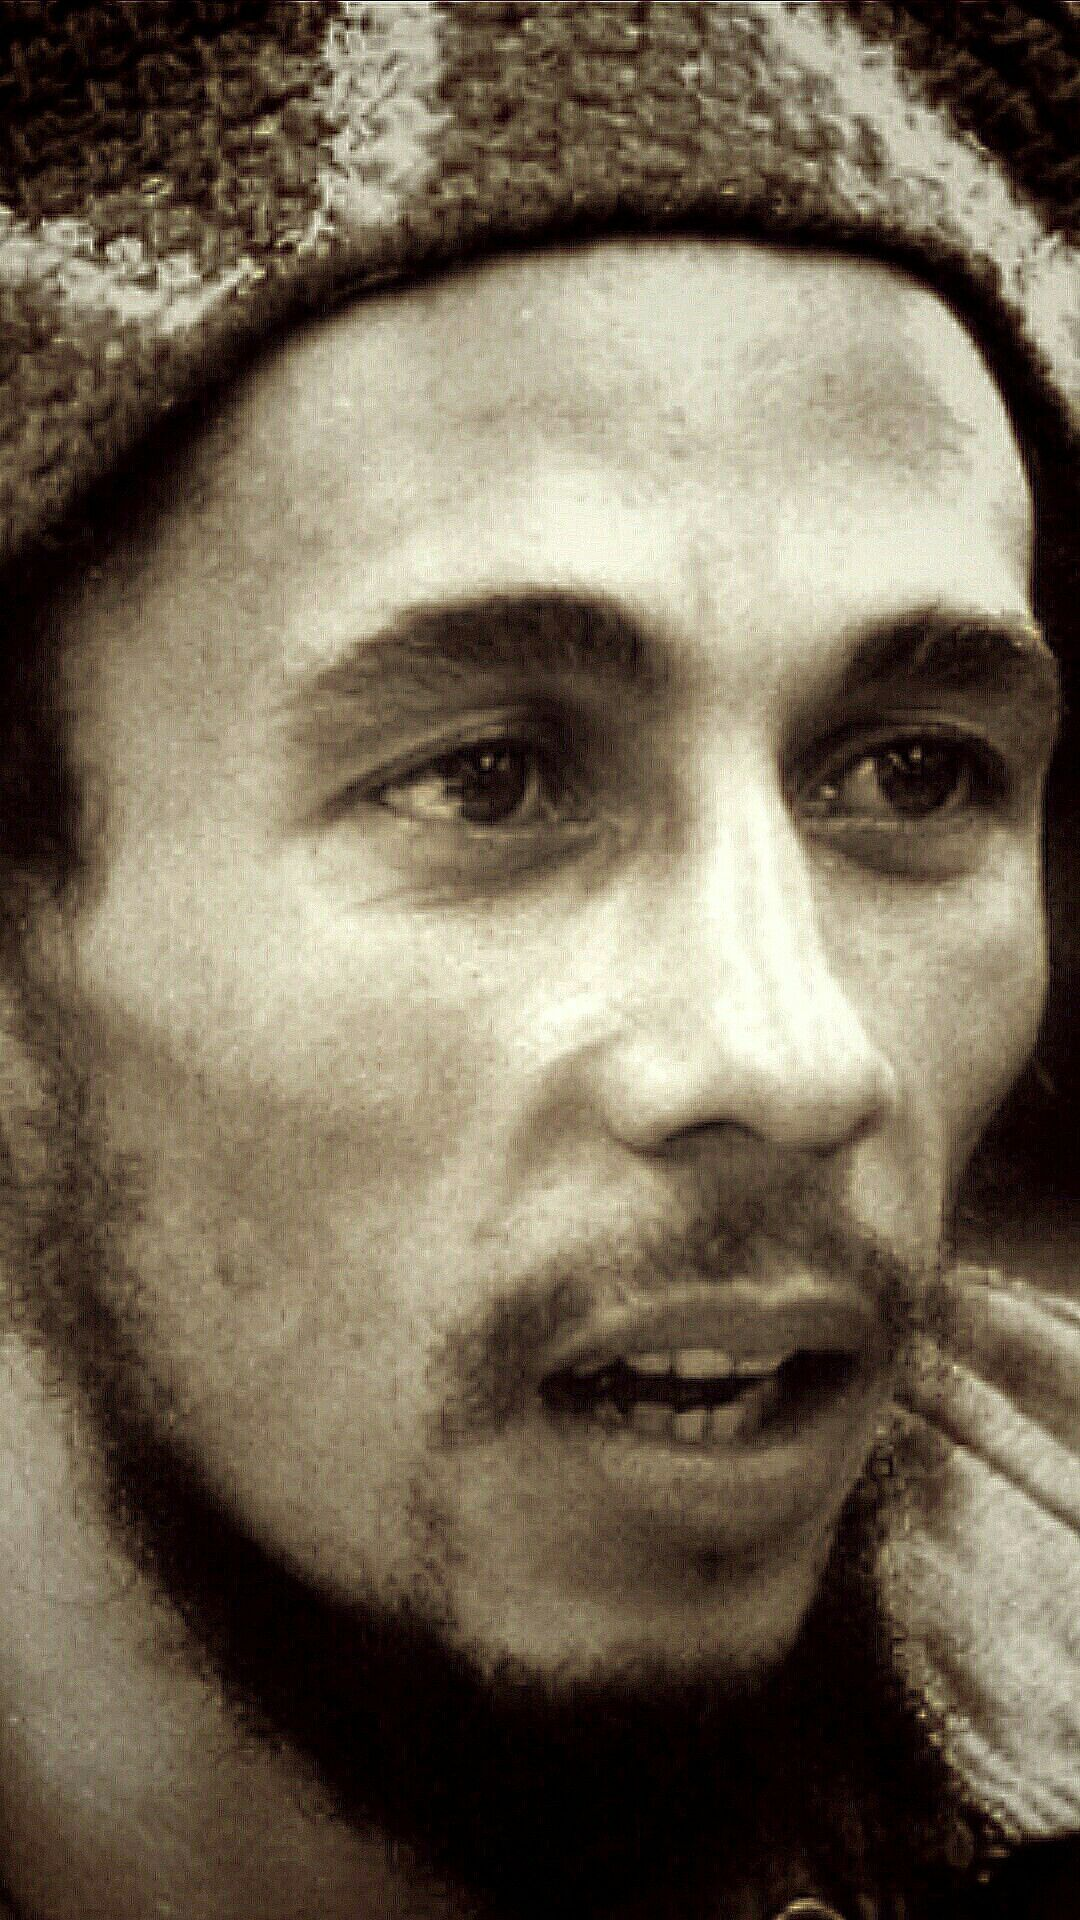 Edredon Bob Marley.Pin By Nora Elliot On Bob Marley In 2019 Reggae Bob Marley Bob